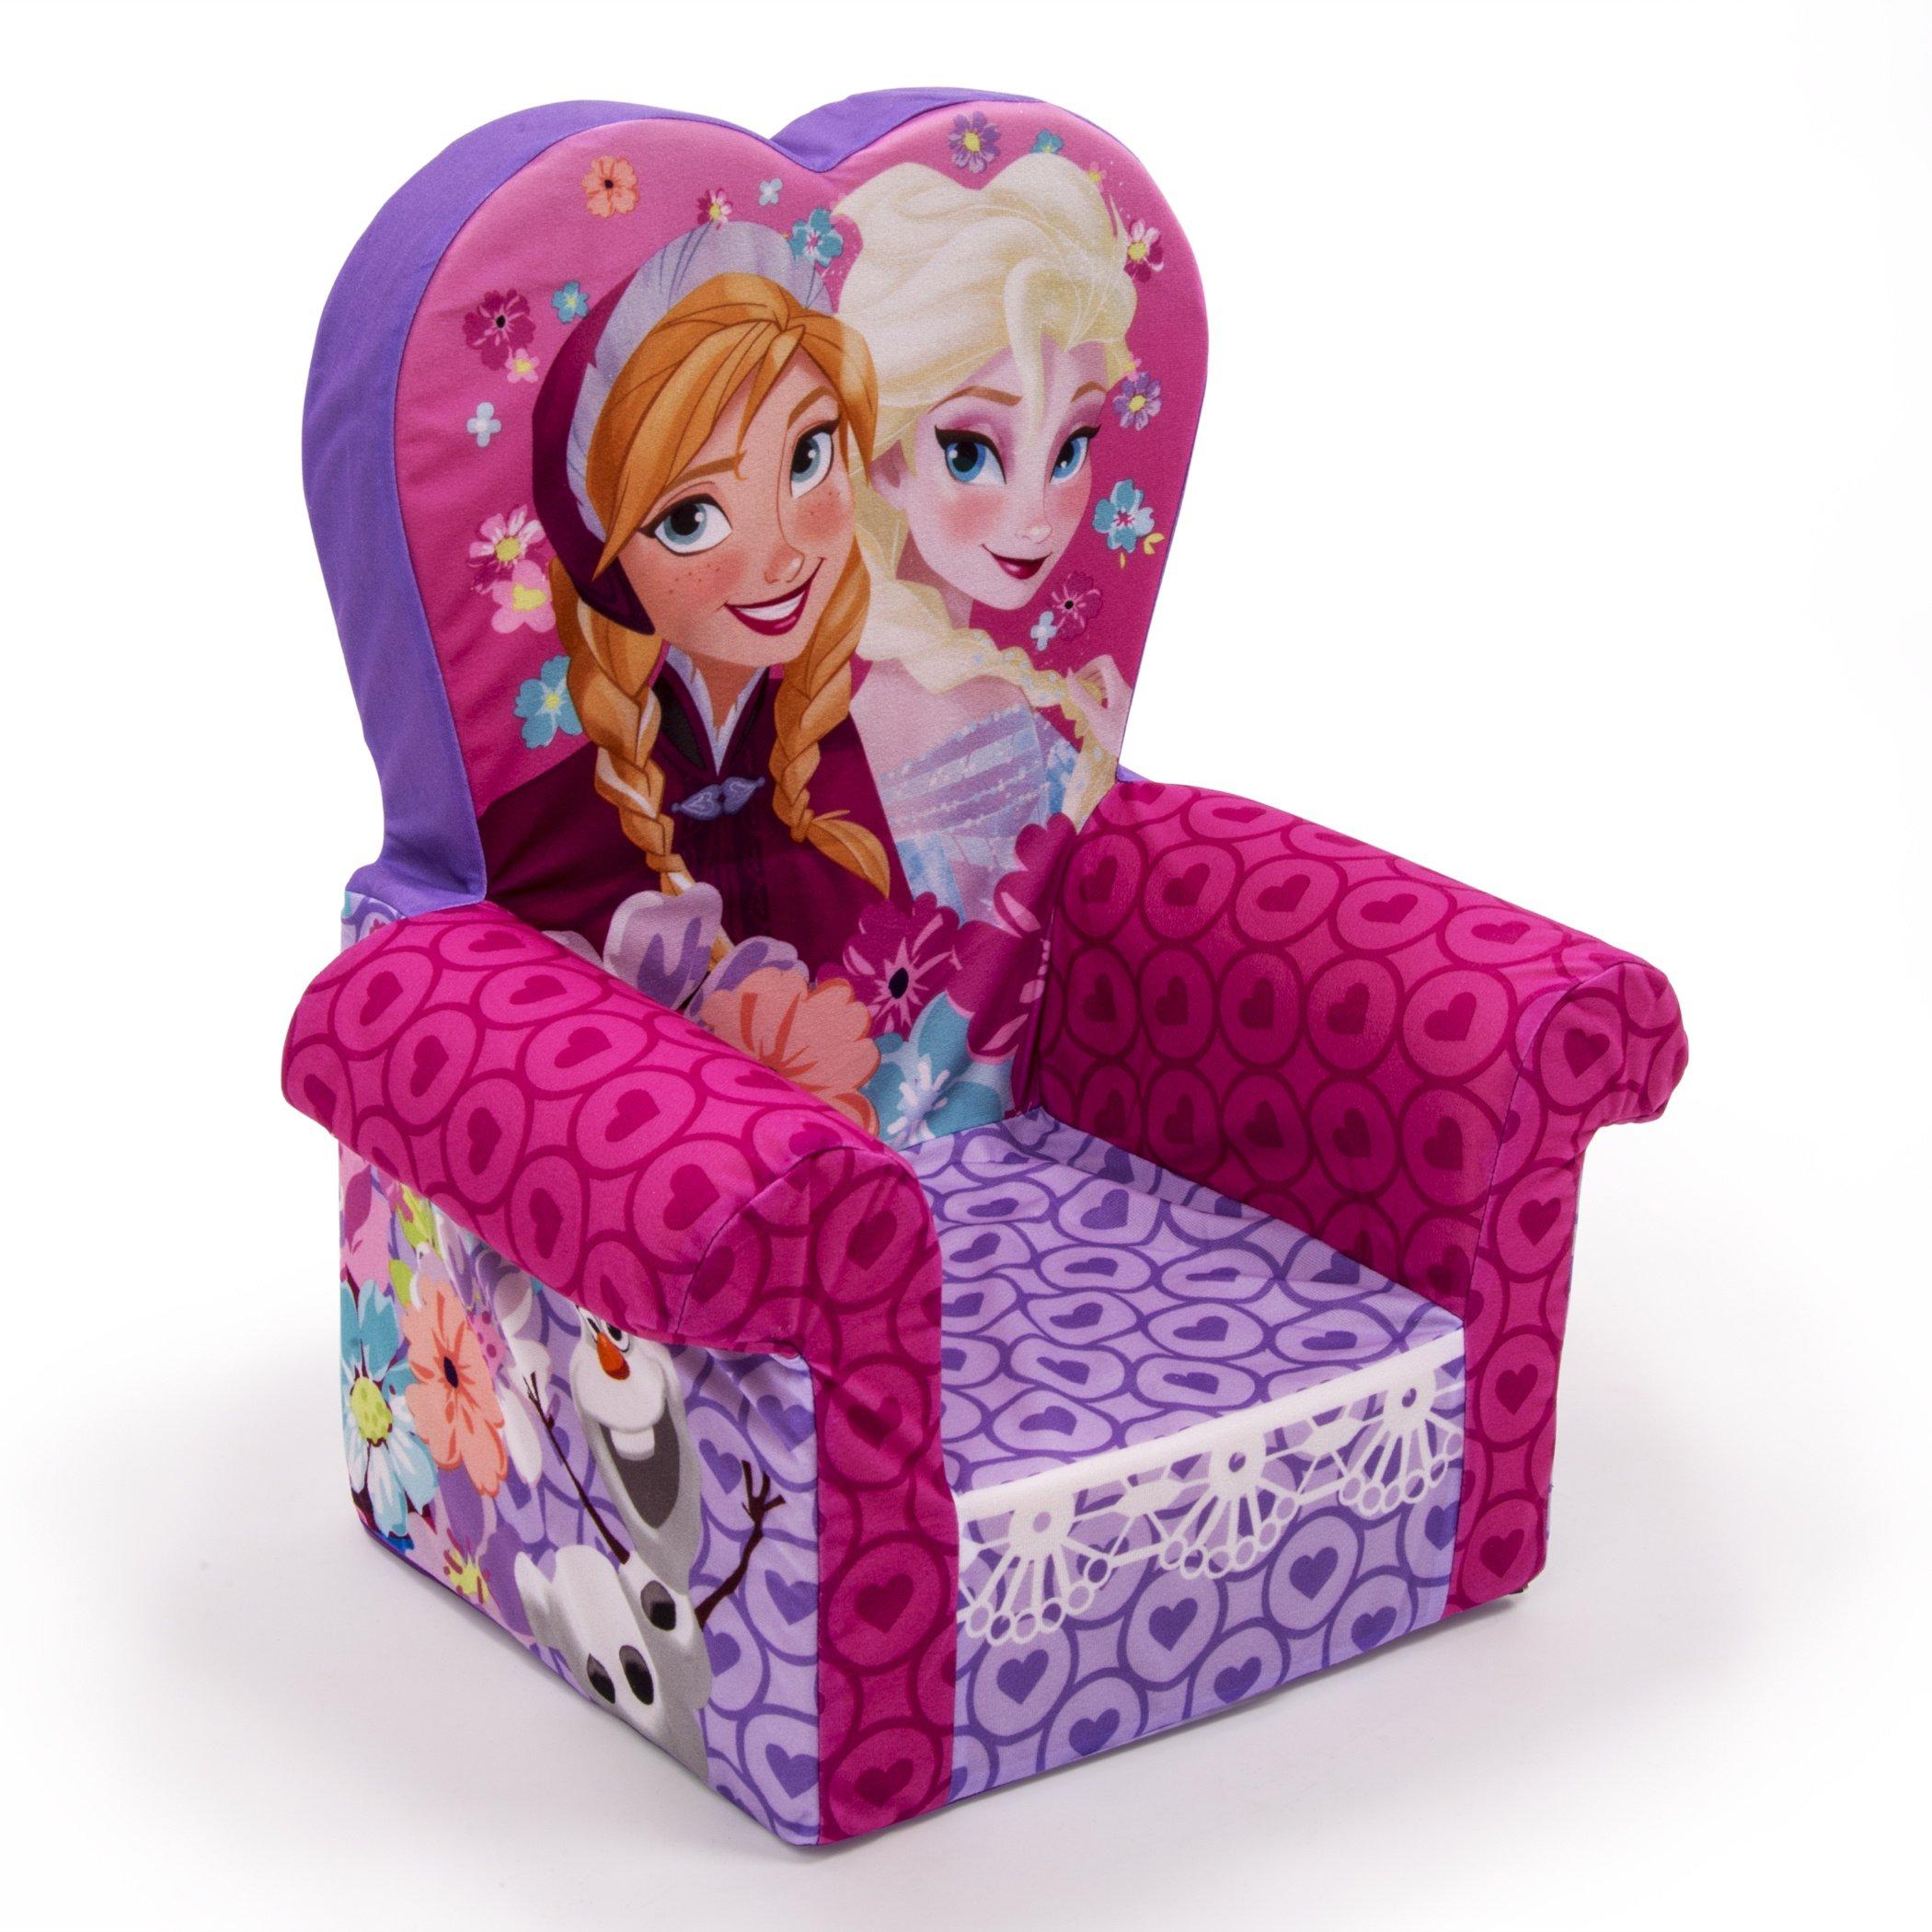 disney sofas chair frozen anna elsa princess kids girls